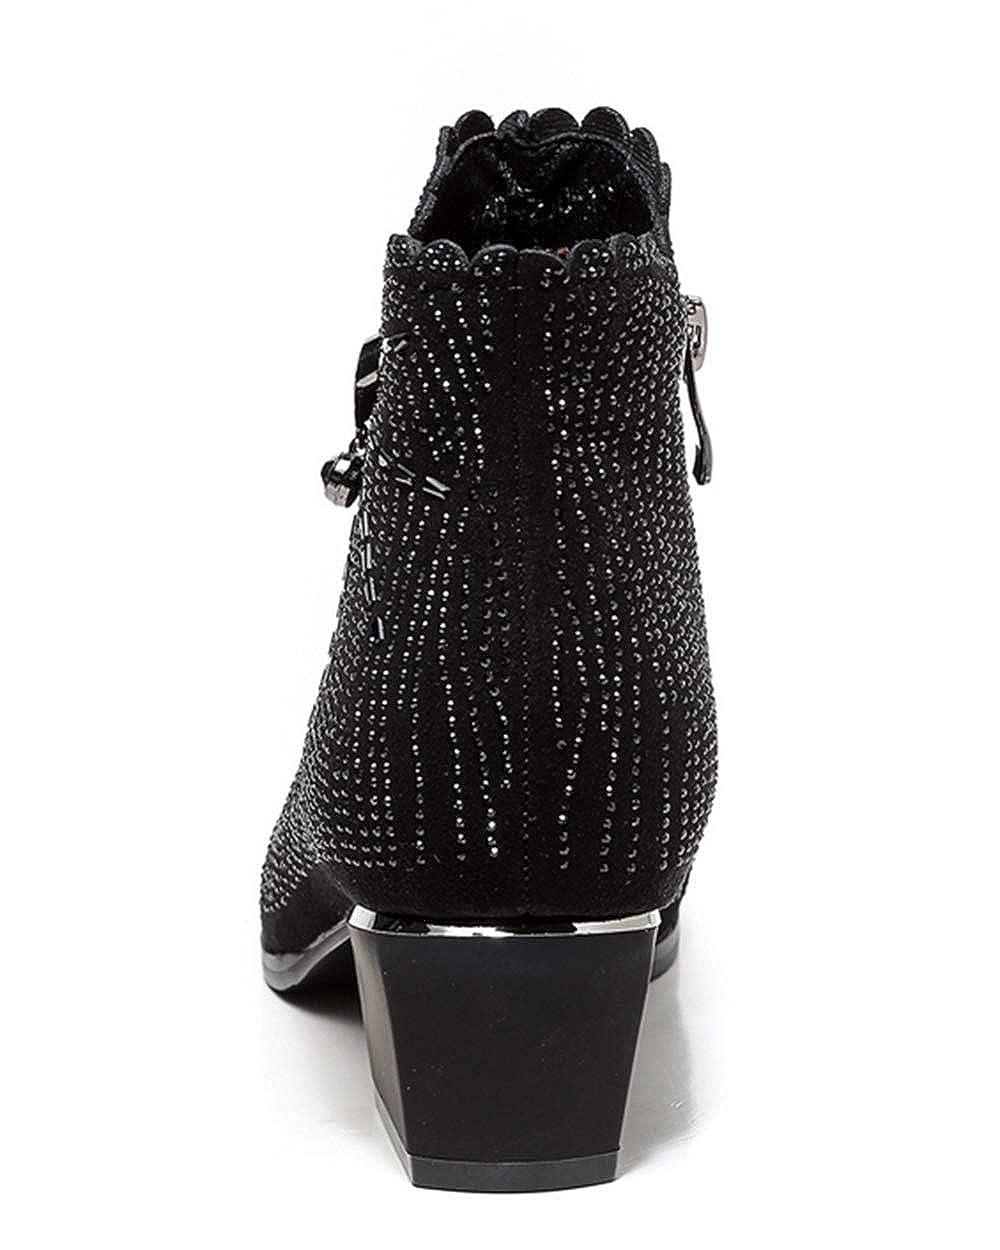 Shiney Frauen Stiefelies 2018 Wintermode New Kurze Chunky Heel High-Heels Einzelne Schuhe Kurze New Stiefel 4f6e5e